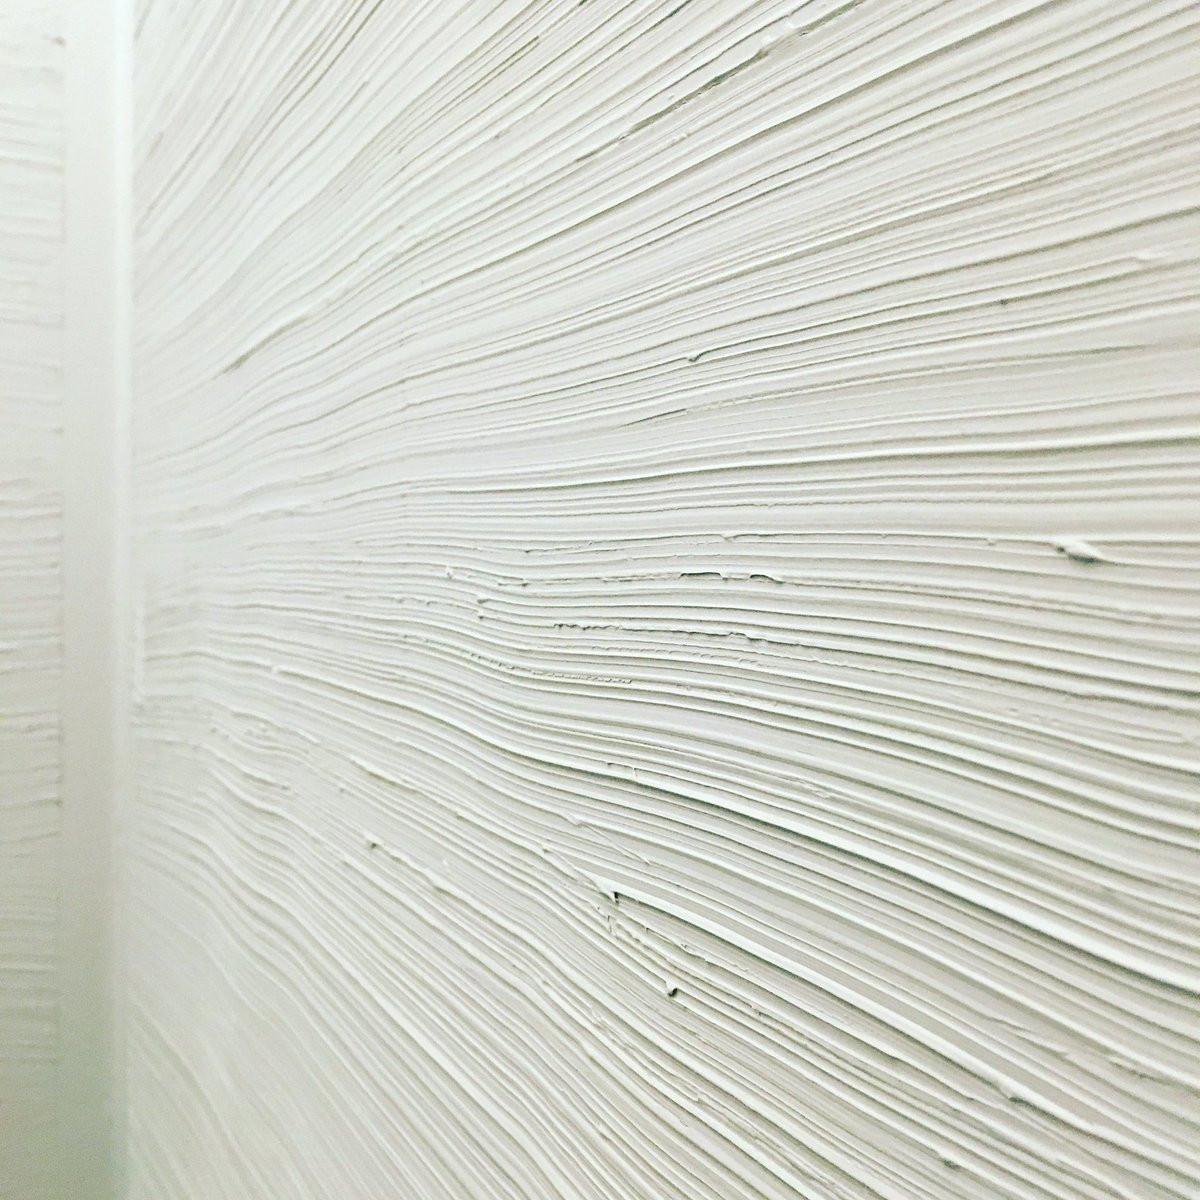 Pareti Pitturate A Fasce colori pitture per pareti moderne: le 10 migliori idee con